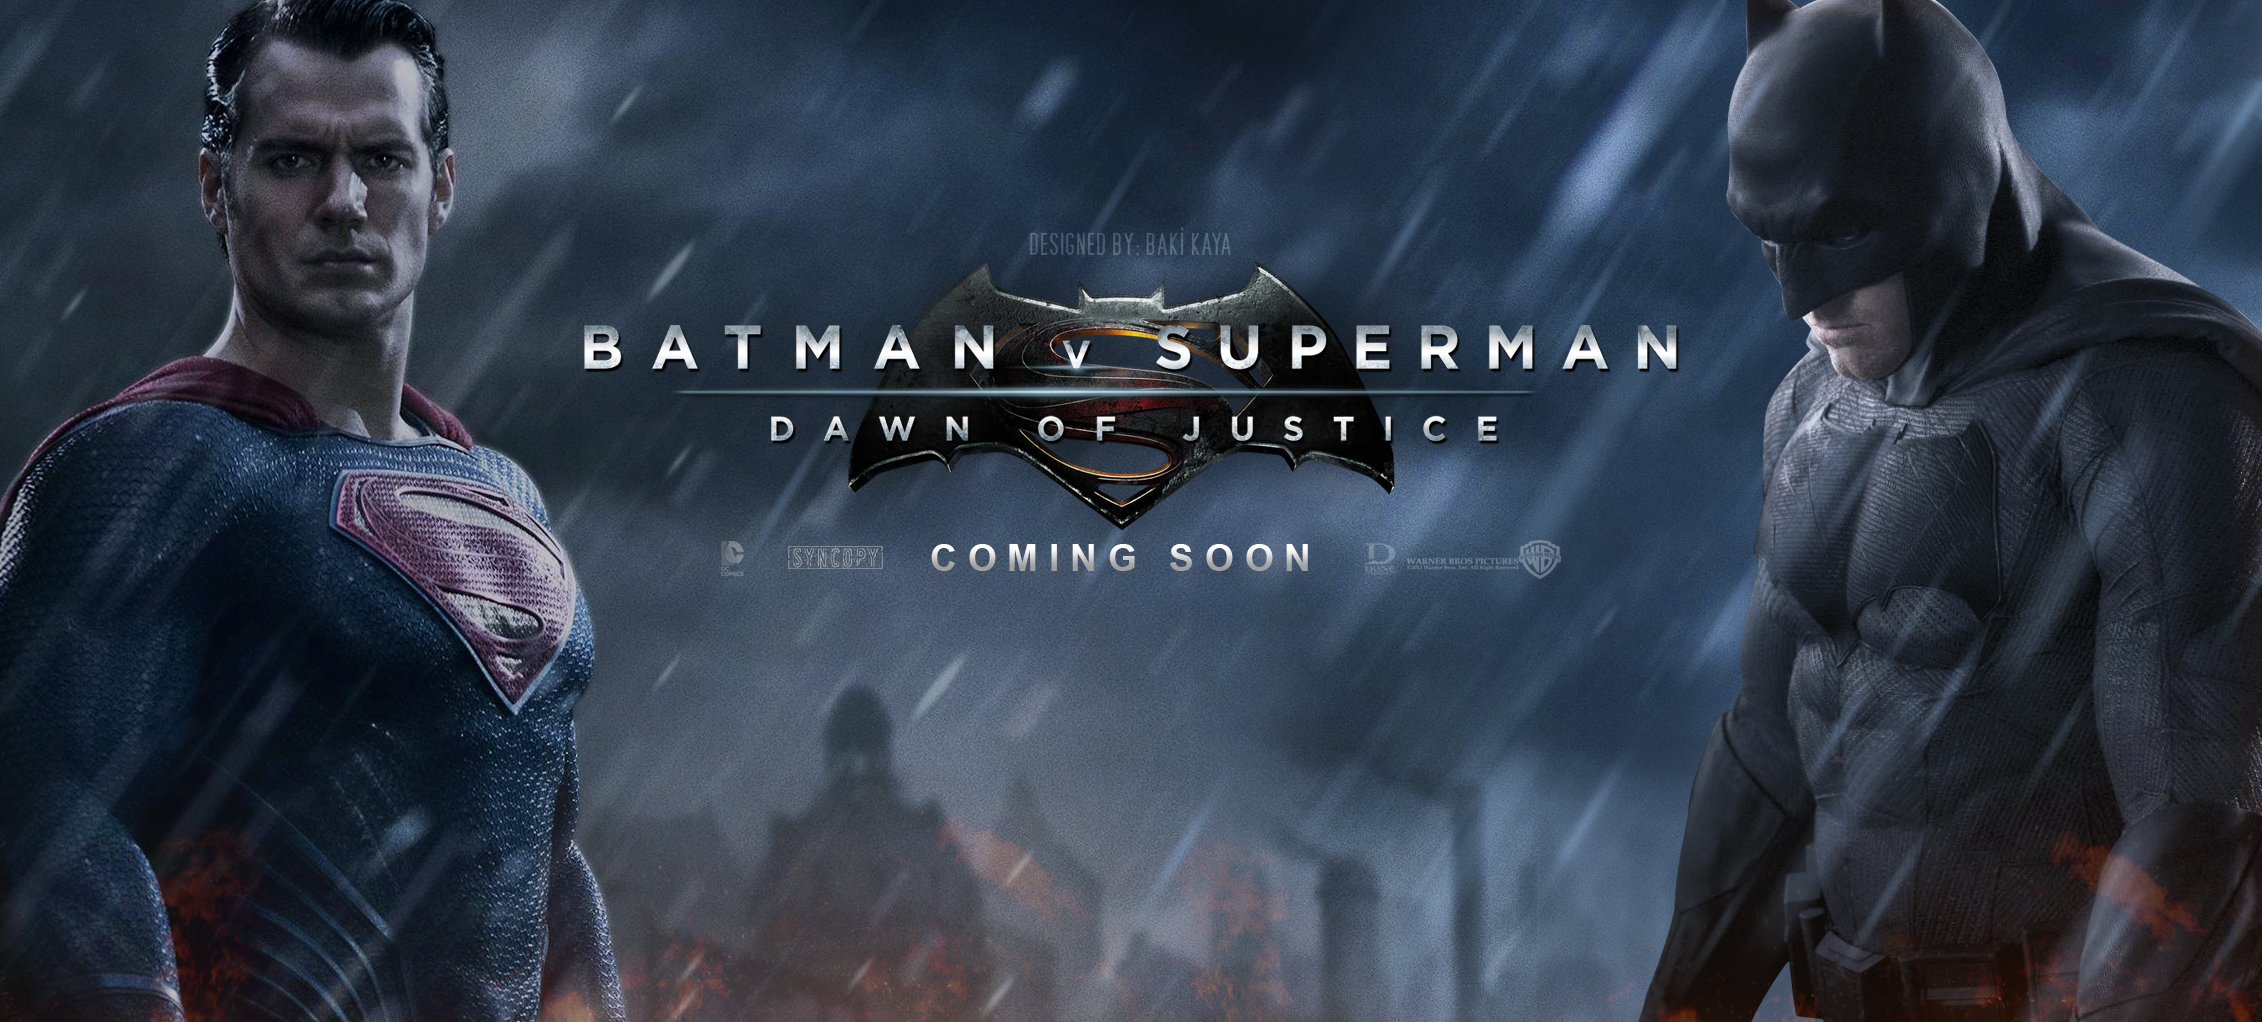 download superman vs batman 2016 full movie